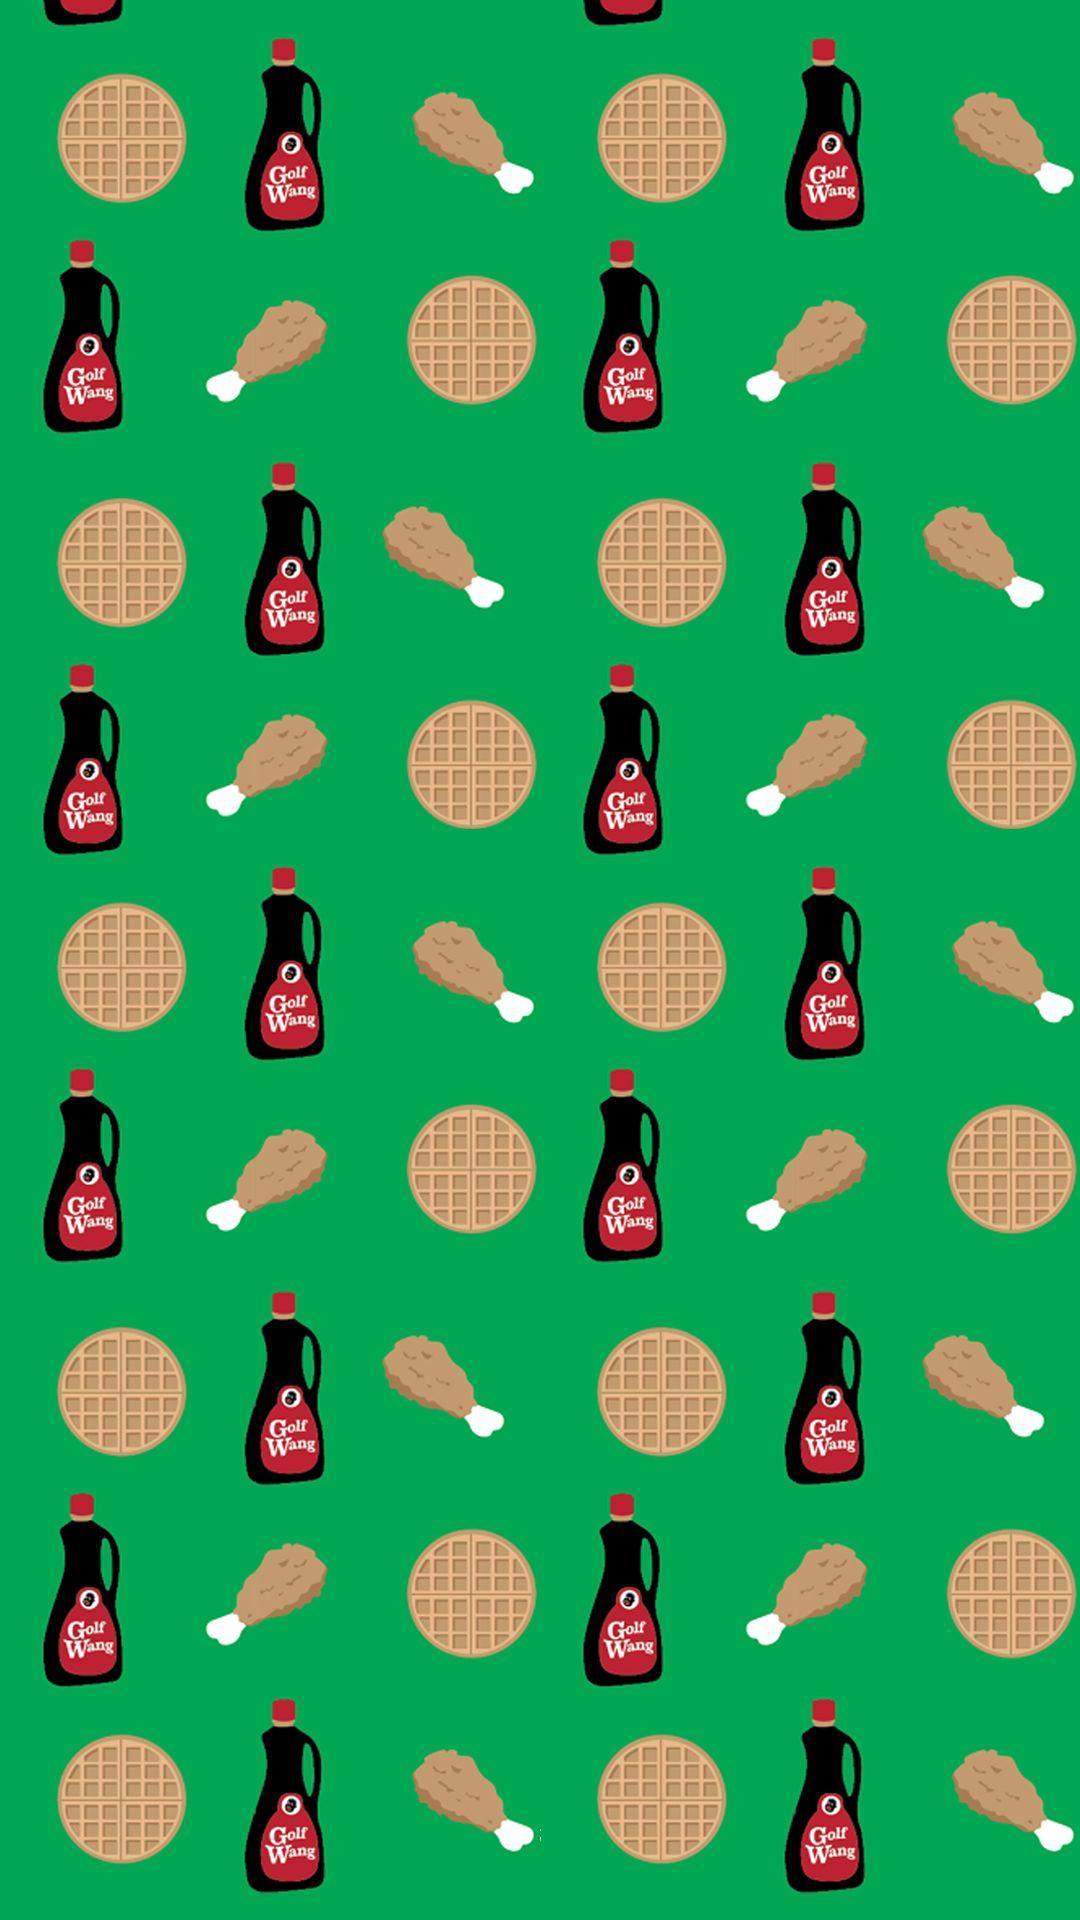 Golf Wang Phone Wallpapers Top Free Golf Wang Phone Backgrounds Wallpaperaccess